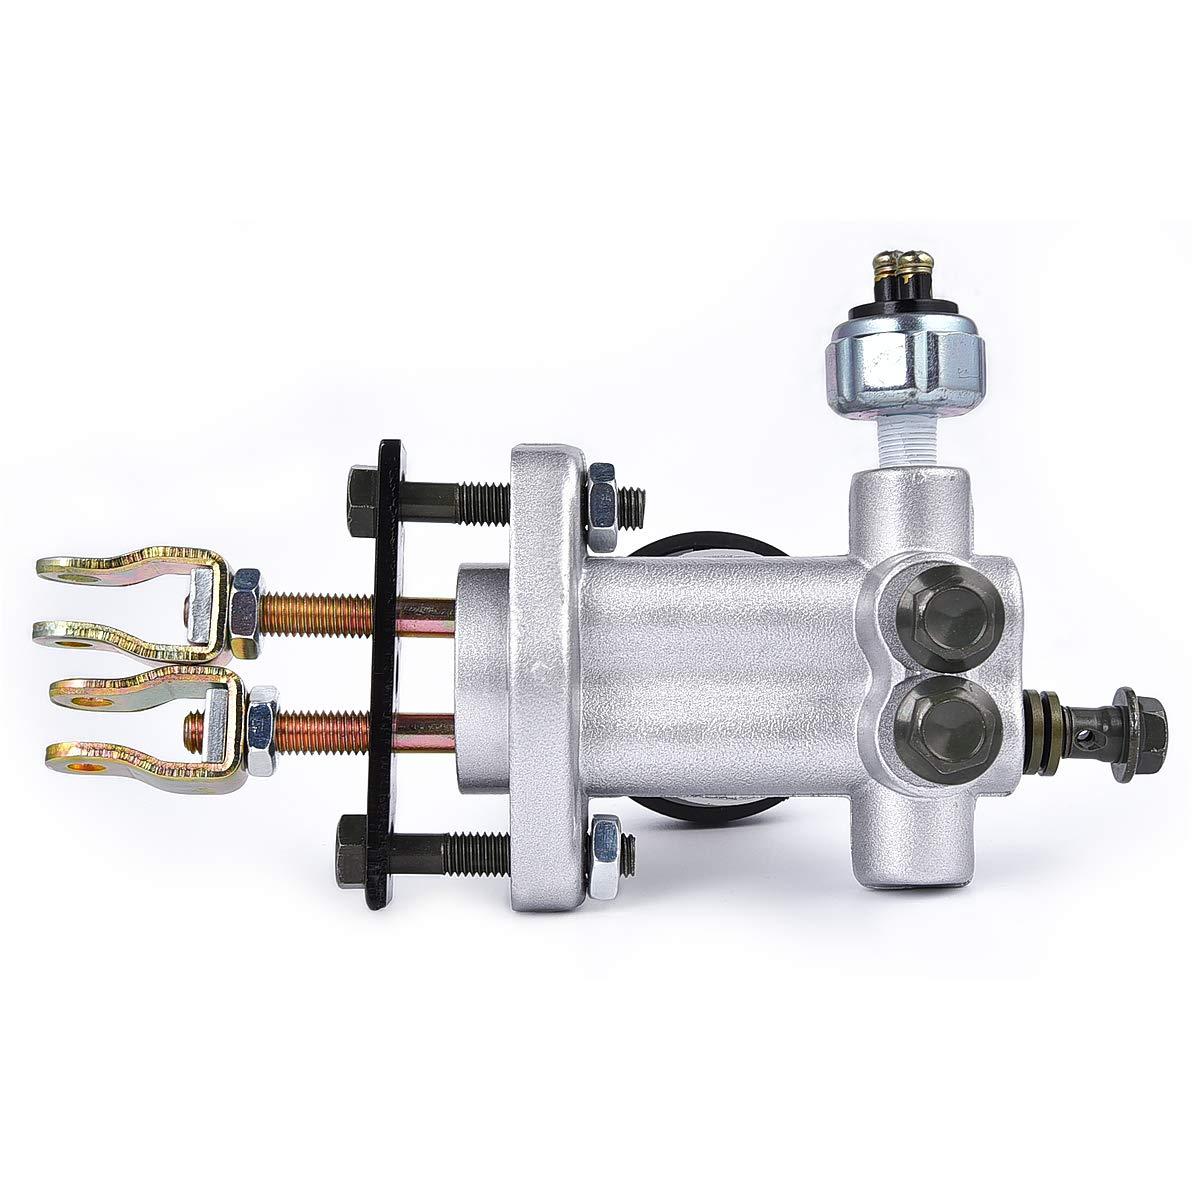 509-3005 Carter Talon 150 150cc Go Kart Dune Buggy Hydraulic Brake Master Cylinder Assembly 552-3005